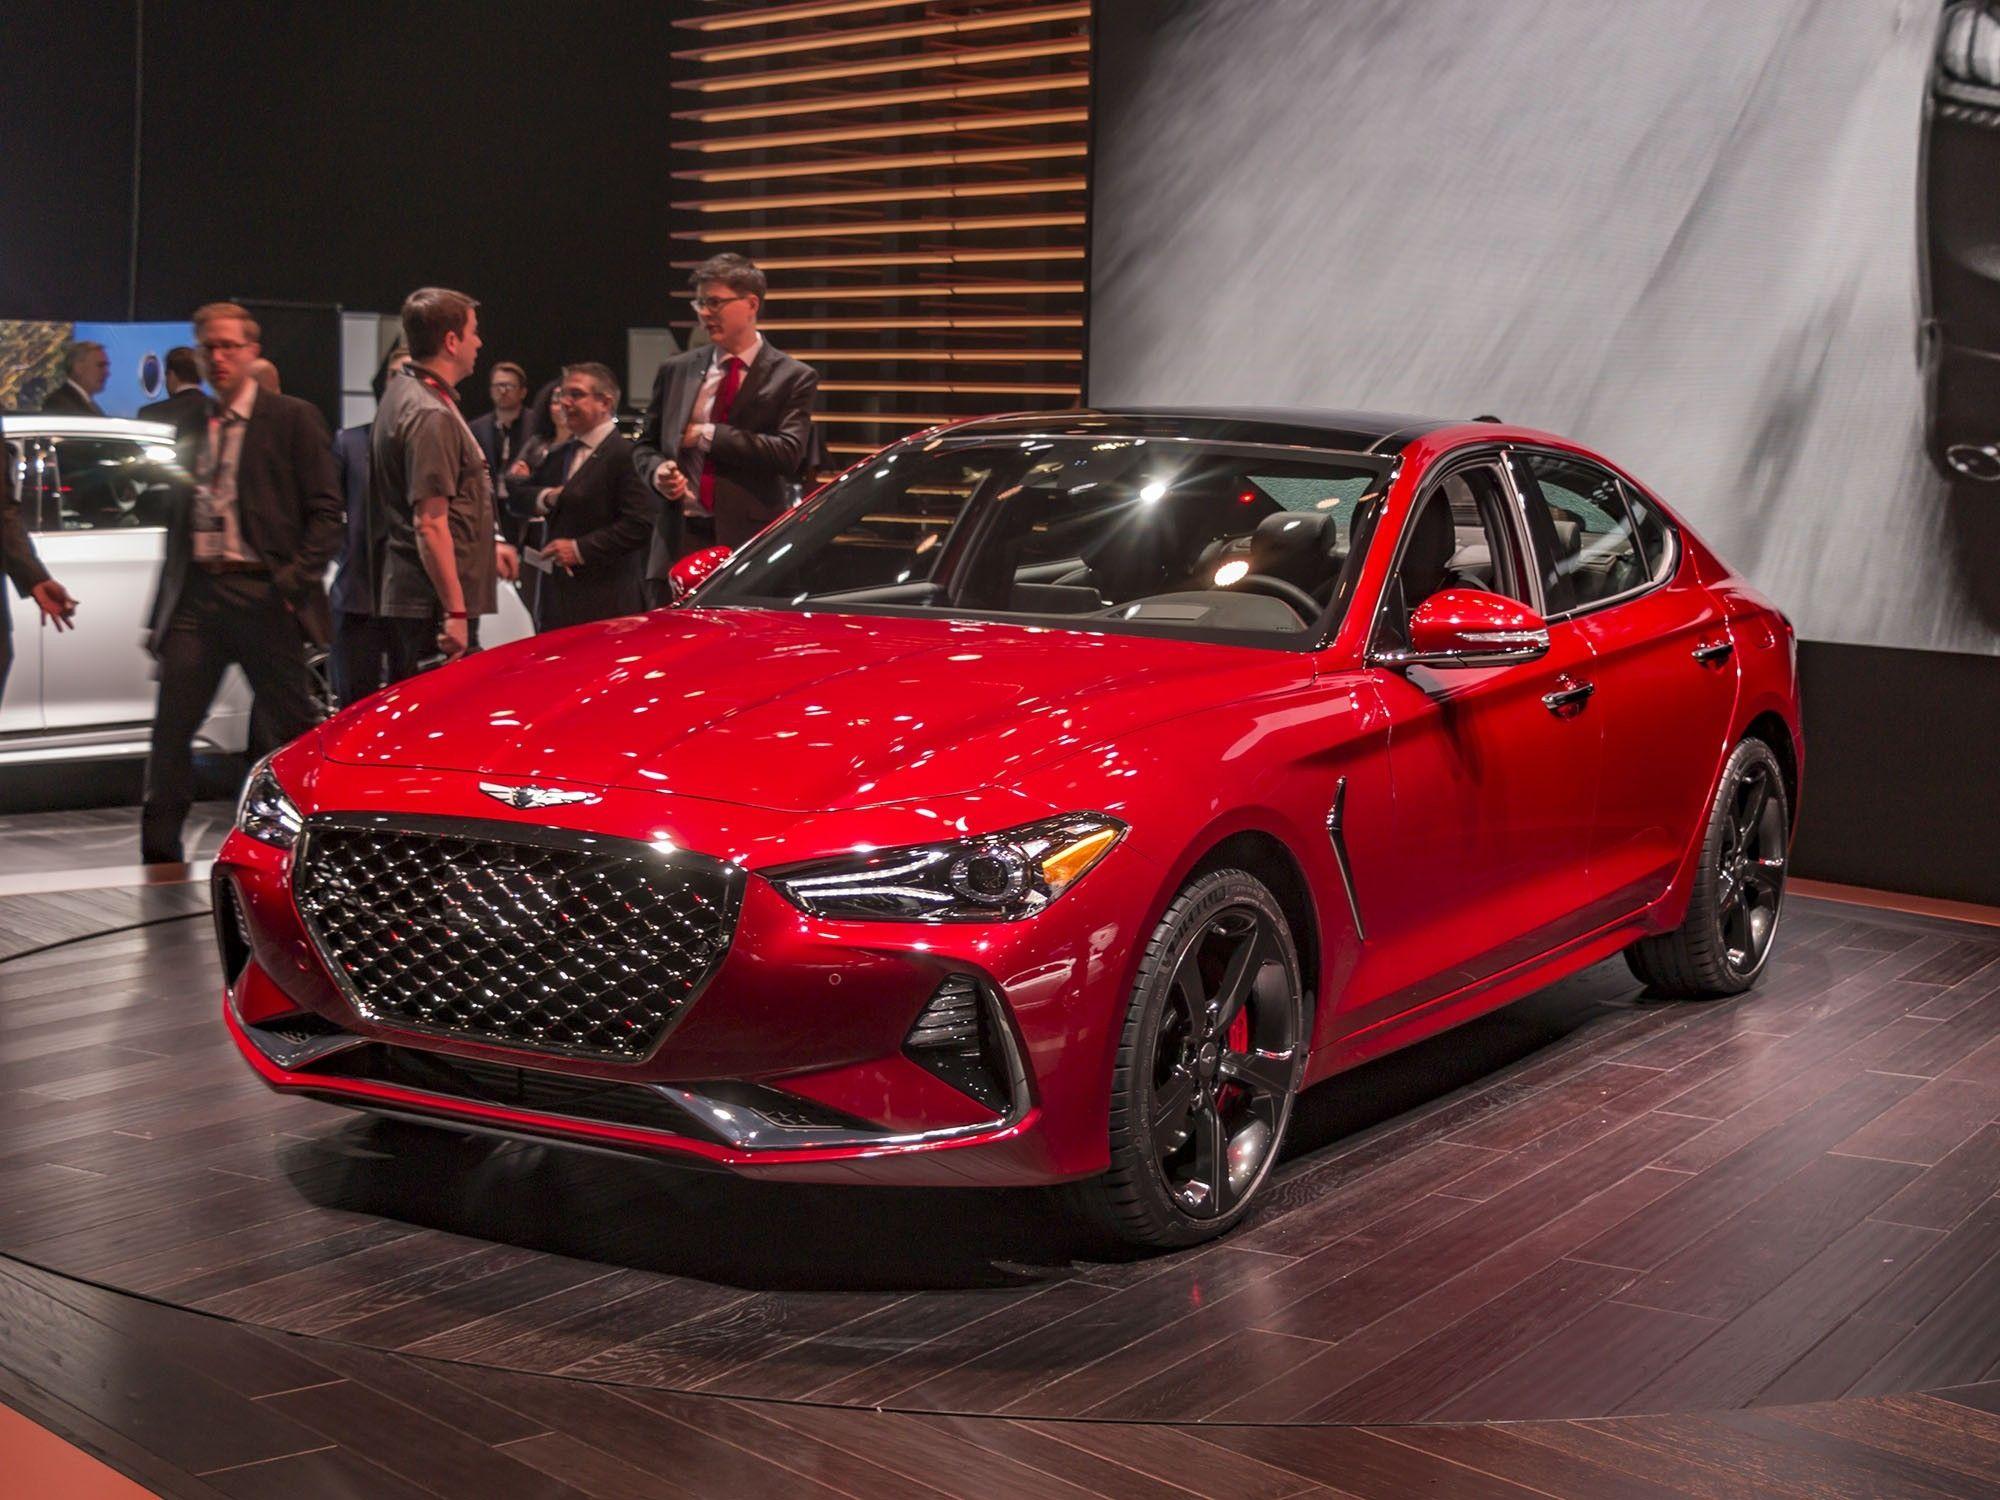 Genesis G70 Luxury Sedan New Cars Car Interior